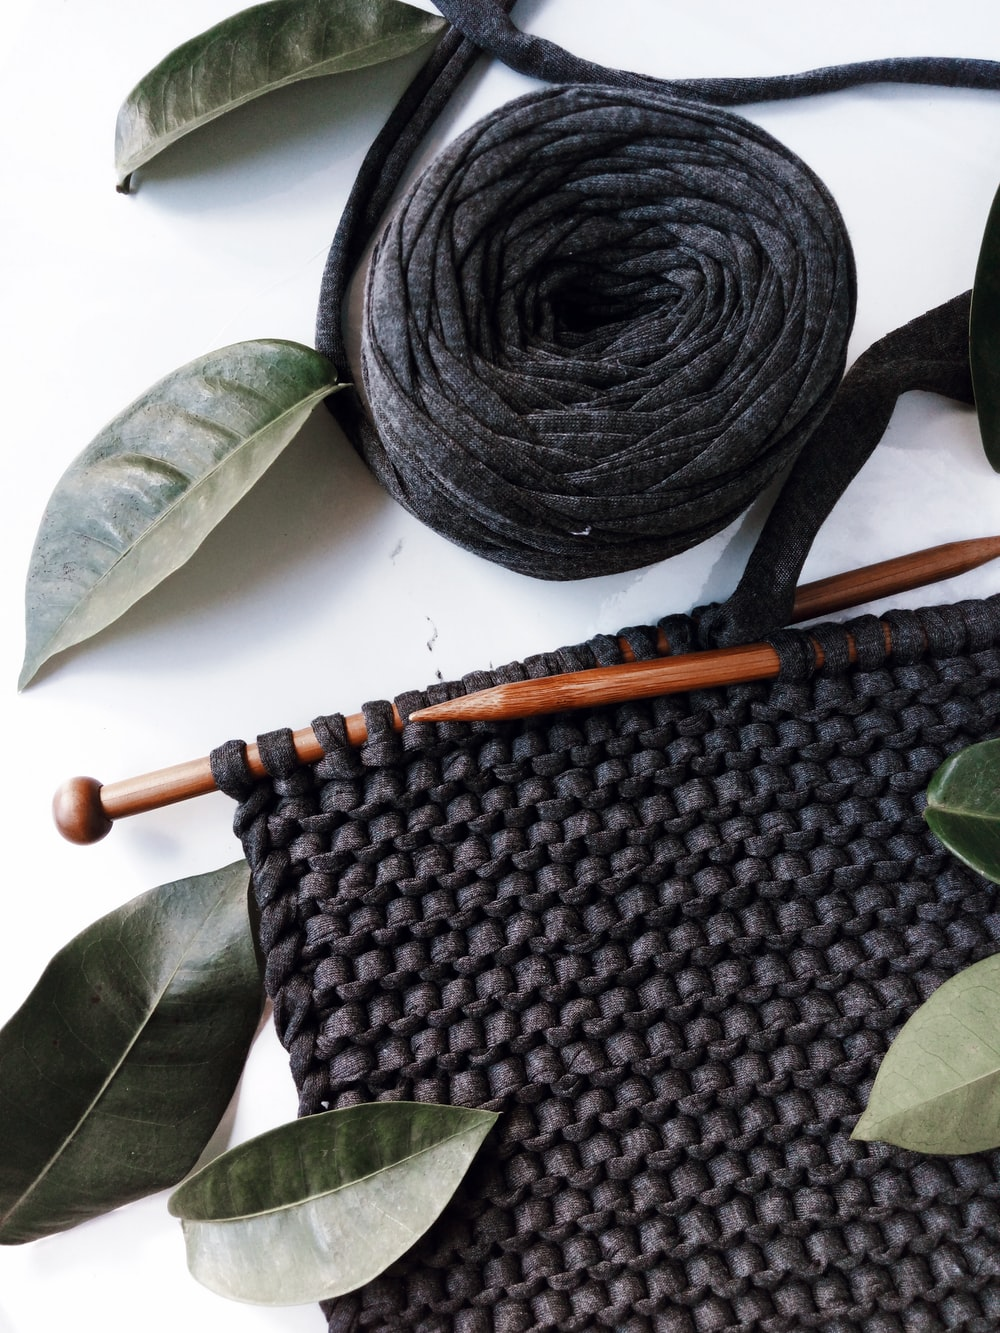 close-up photo of black textile